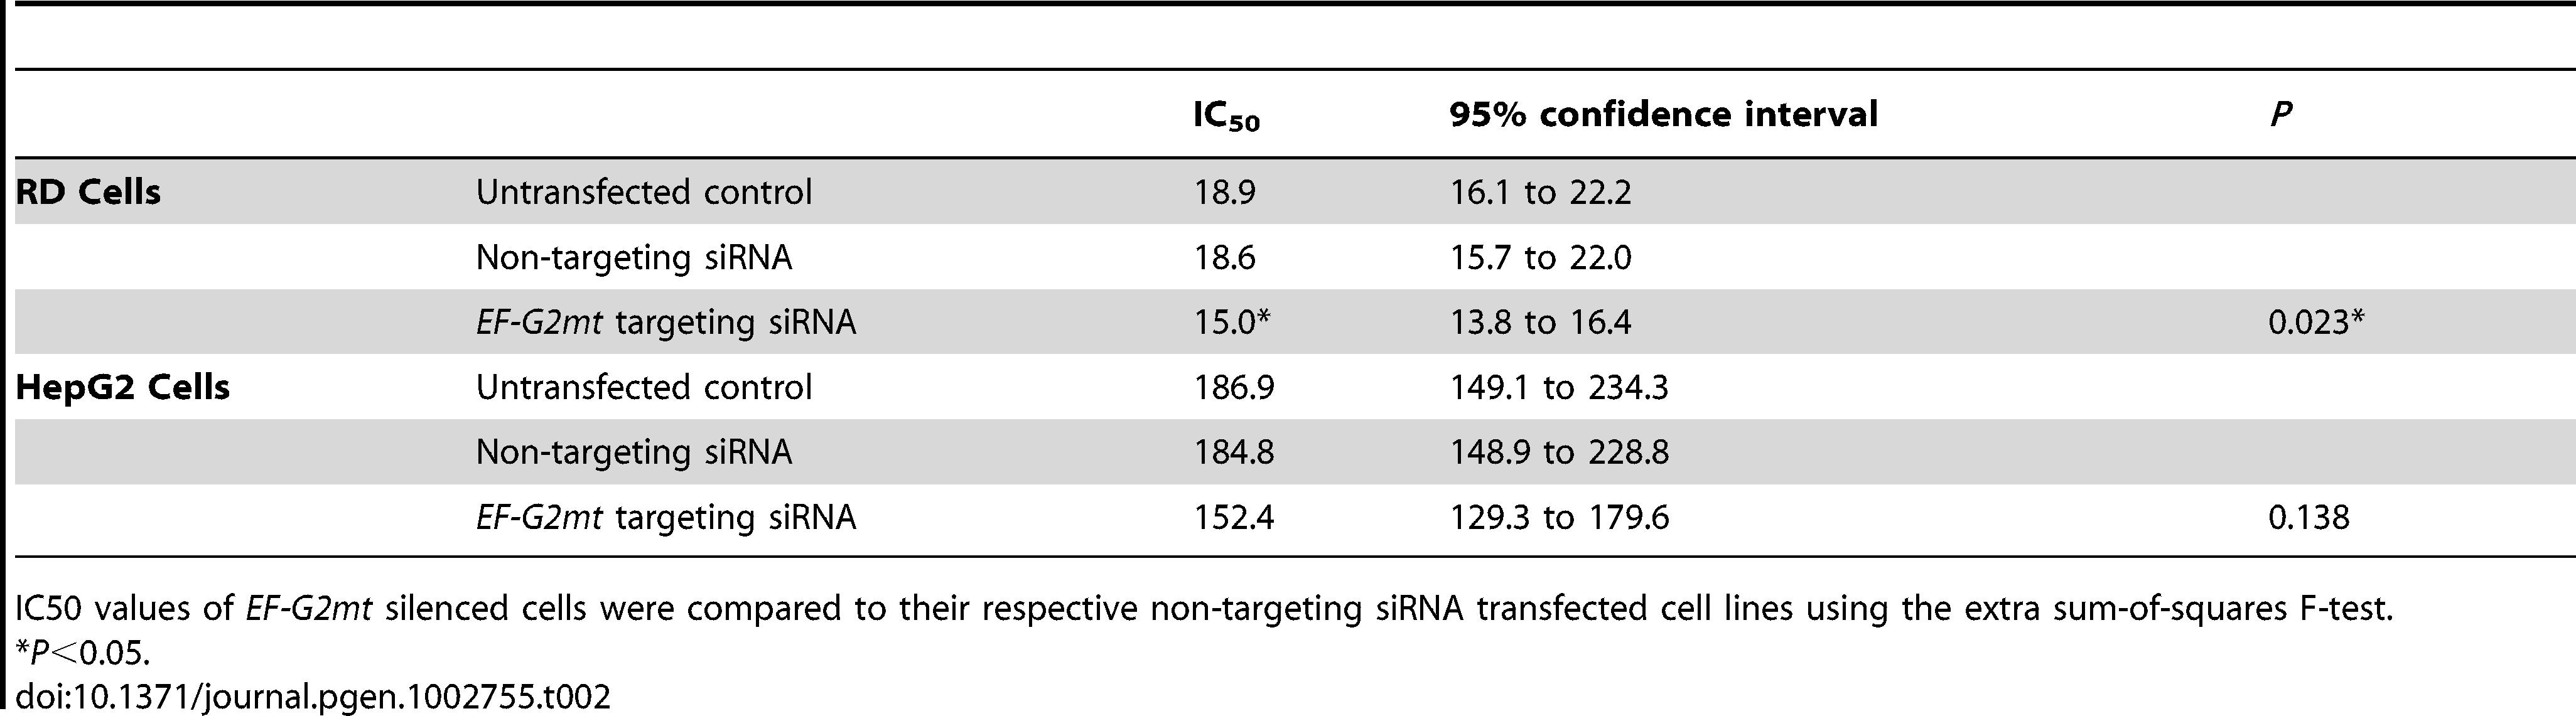 IC<sub>50</sub> values for <i>EF-G2mt</i> silenced cells exposed to atorvastatin.